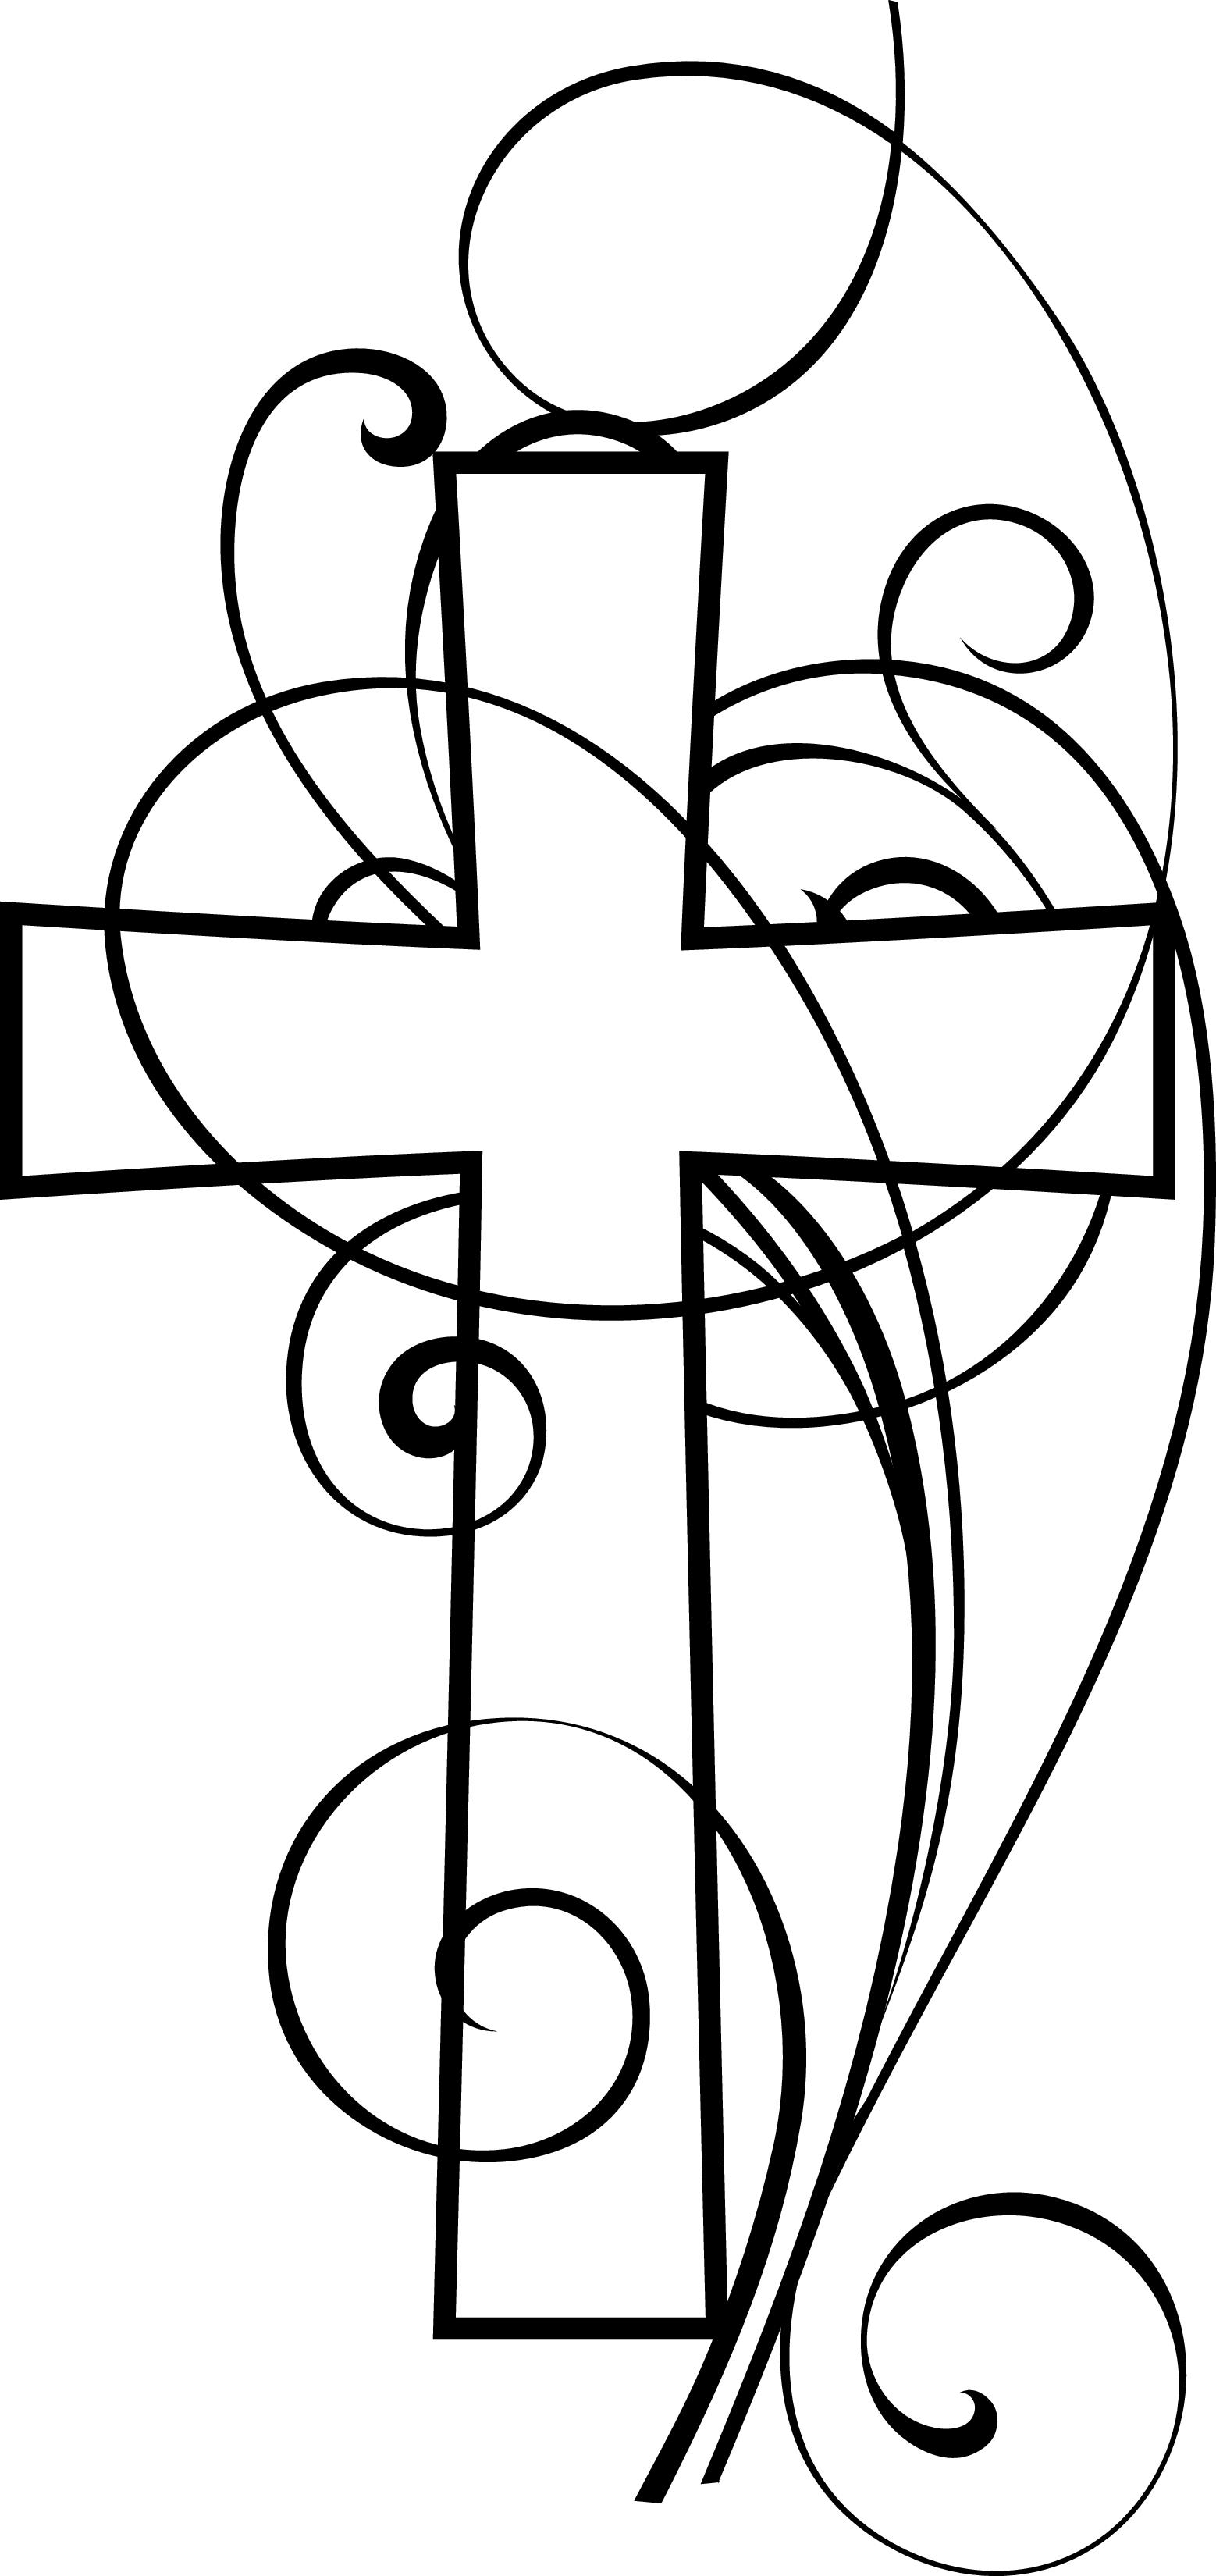 christian cliparts u0026middot; clipart -christian cliparts u0026middot; clipart jesus-0